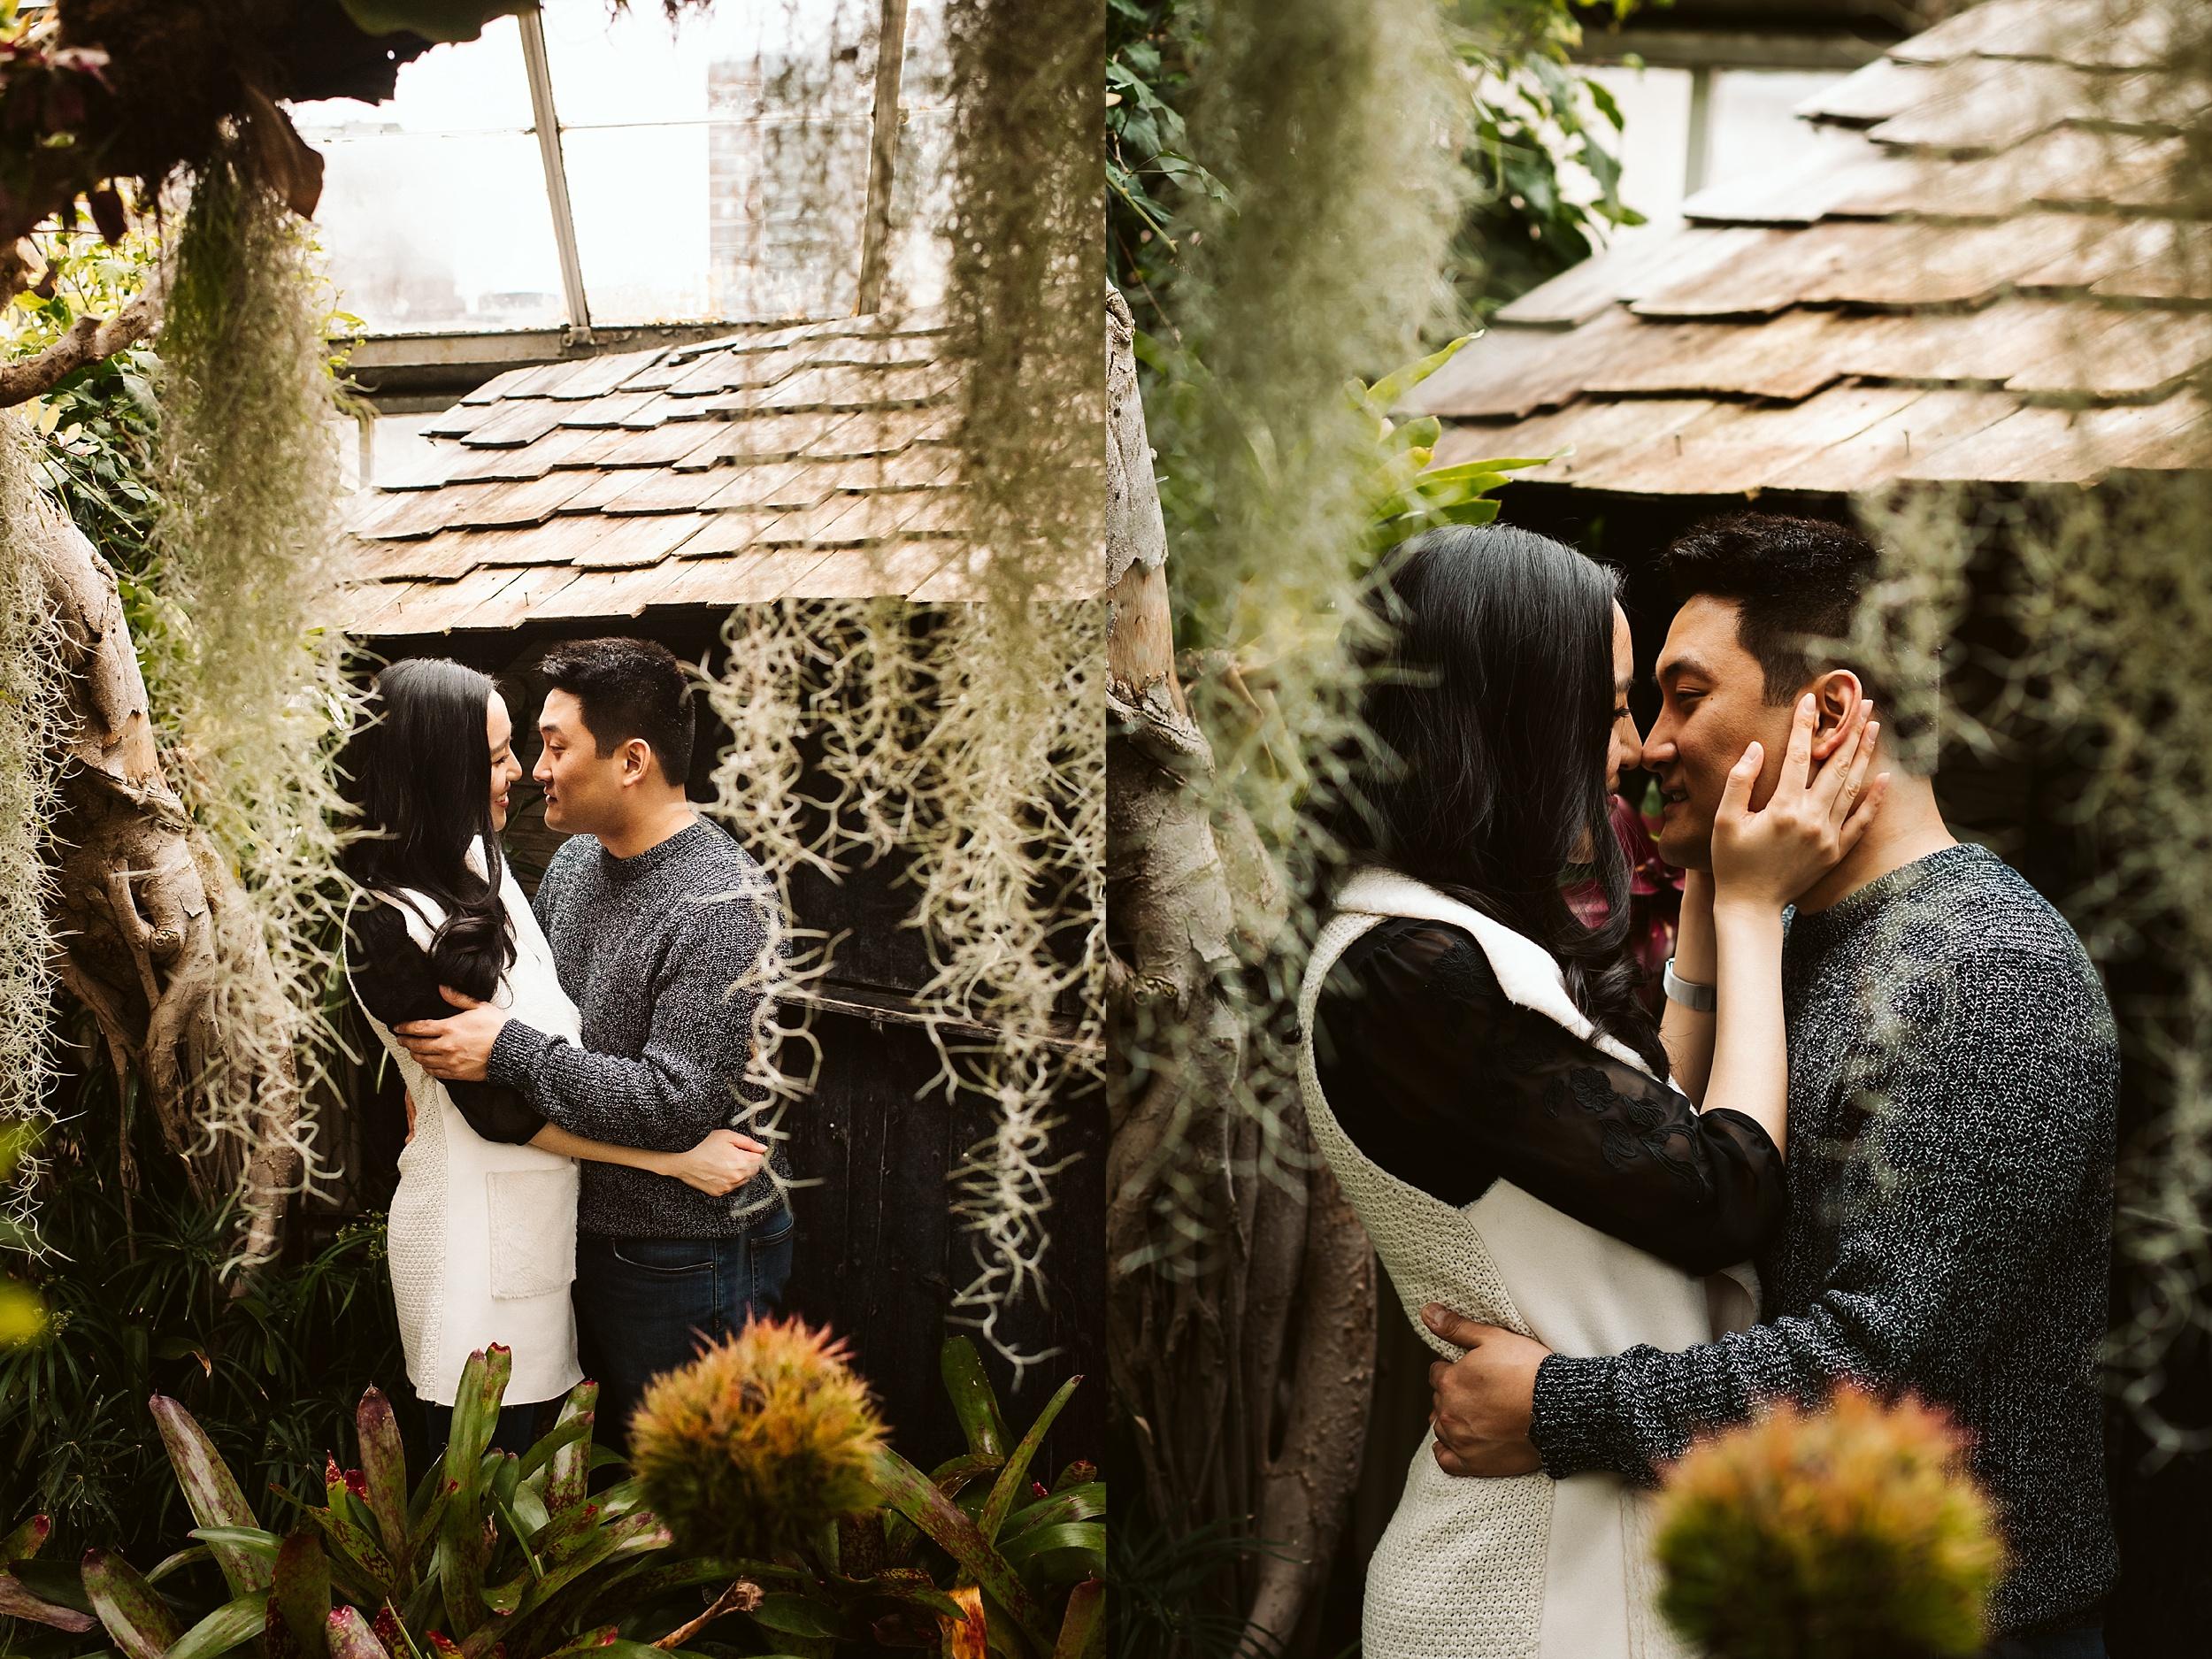 Allan_Gardens_Engagement_Shoot_Toronto_Wedding_Photographer_0005.jpg